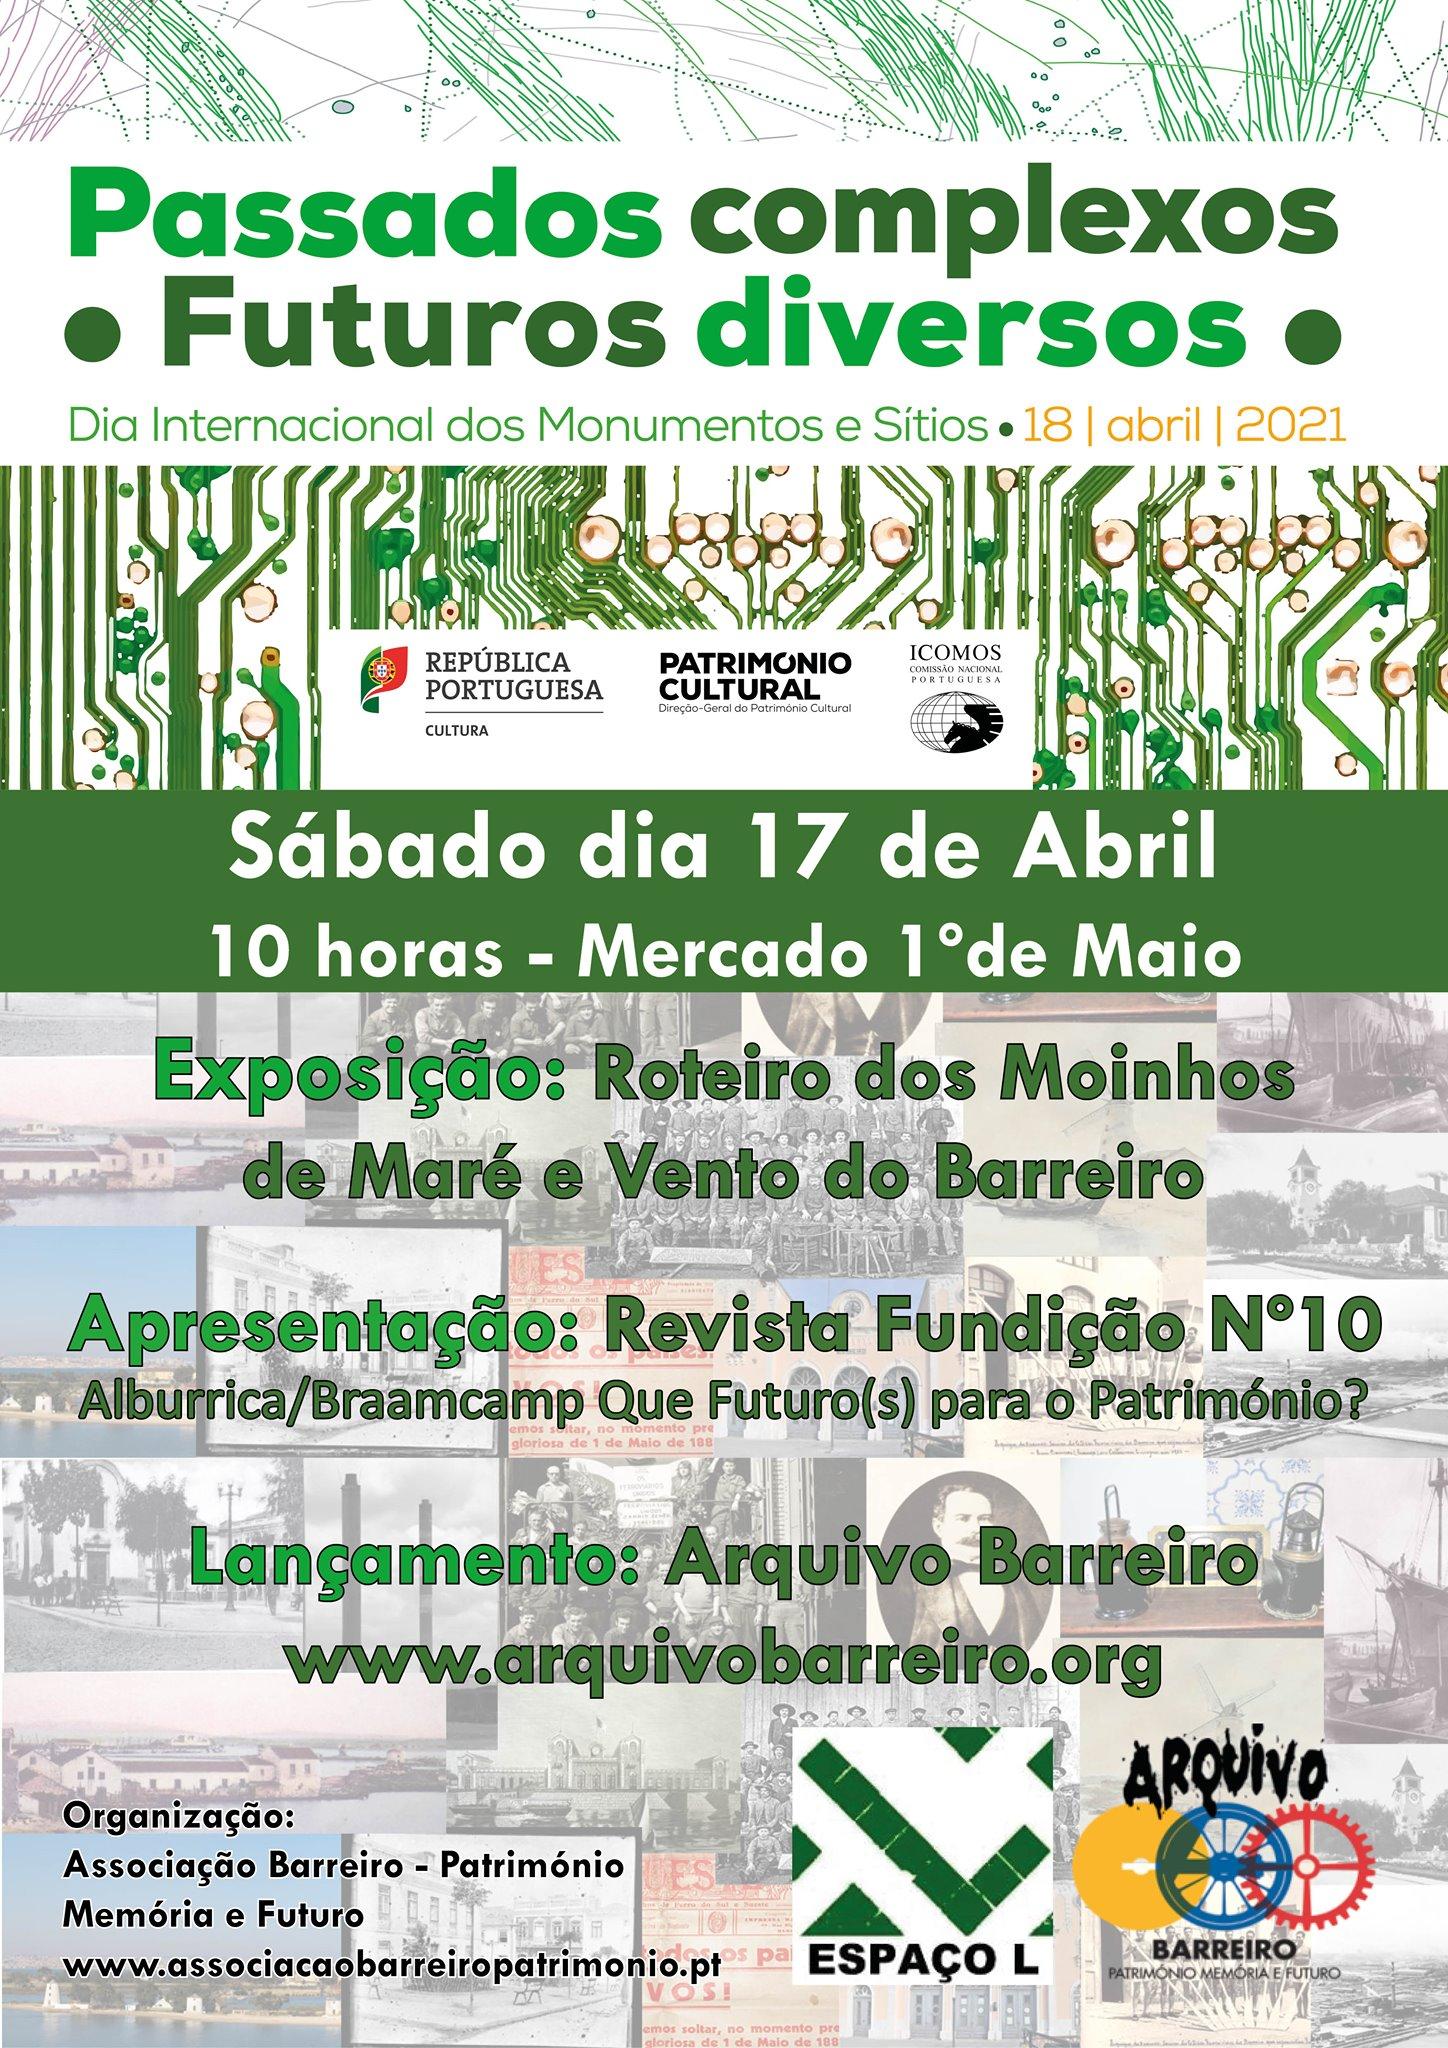 Dia Internacional dos Monumentos e Sítios Alburrica/Braamcamp Que Futuro(s)Para o Património